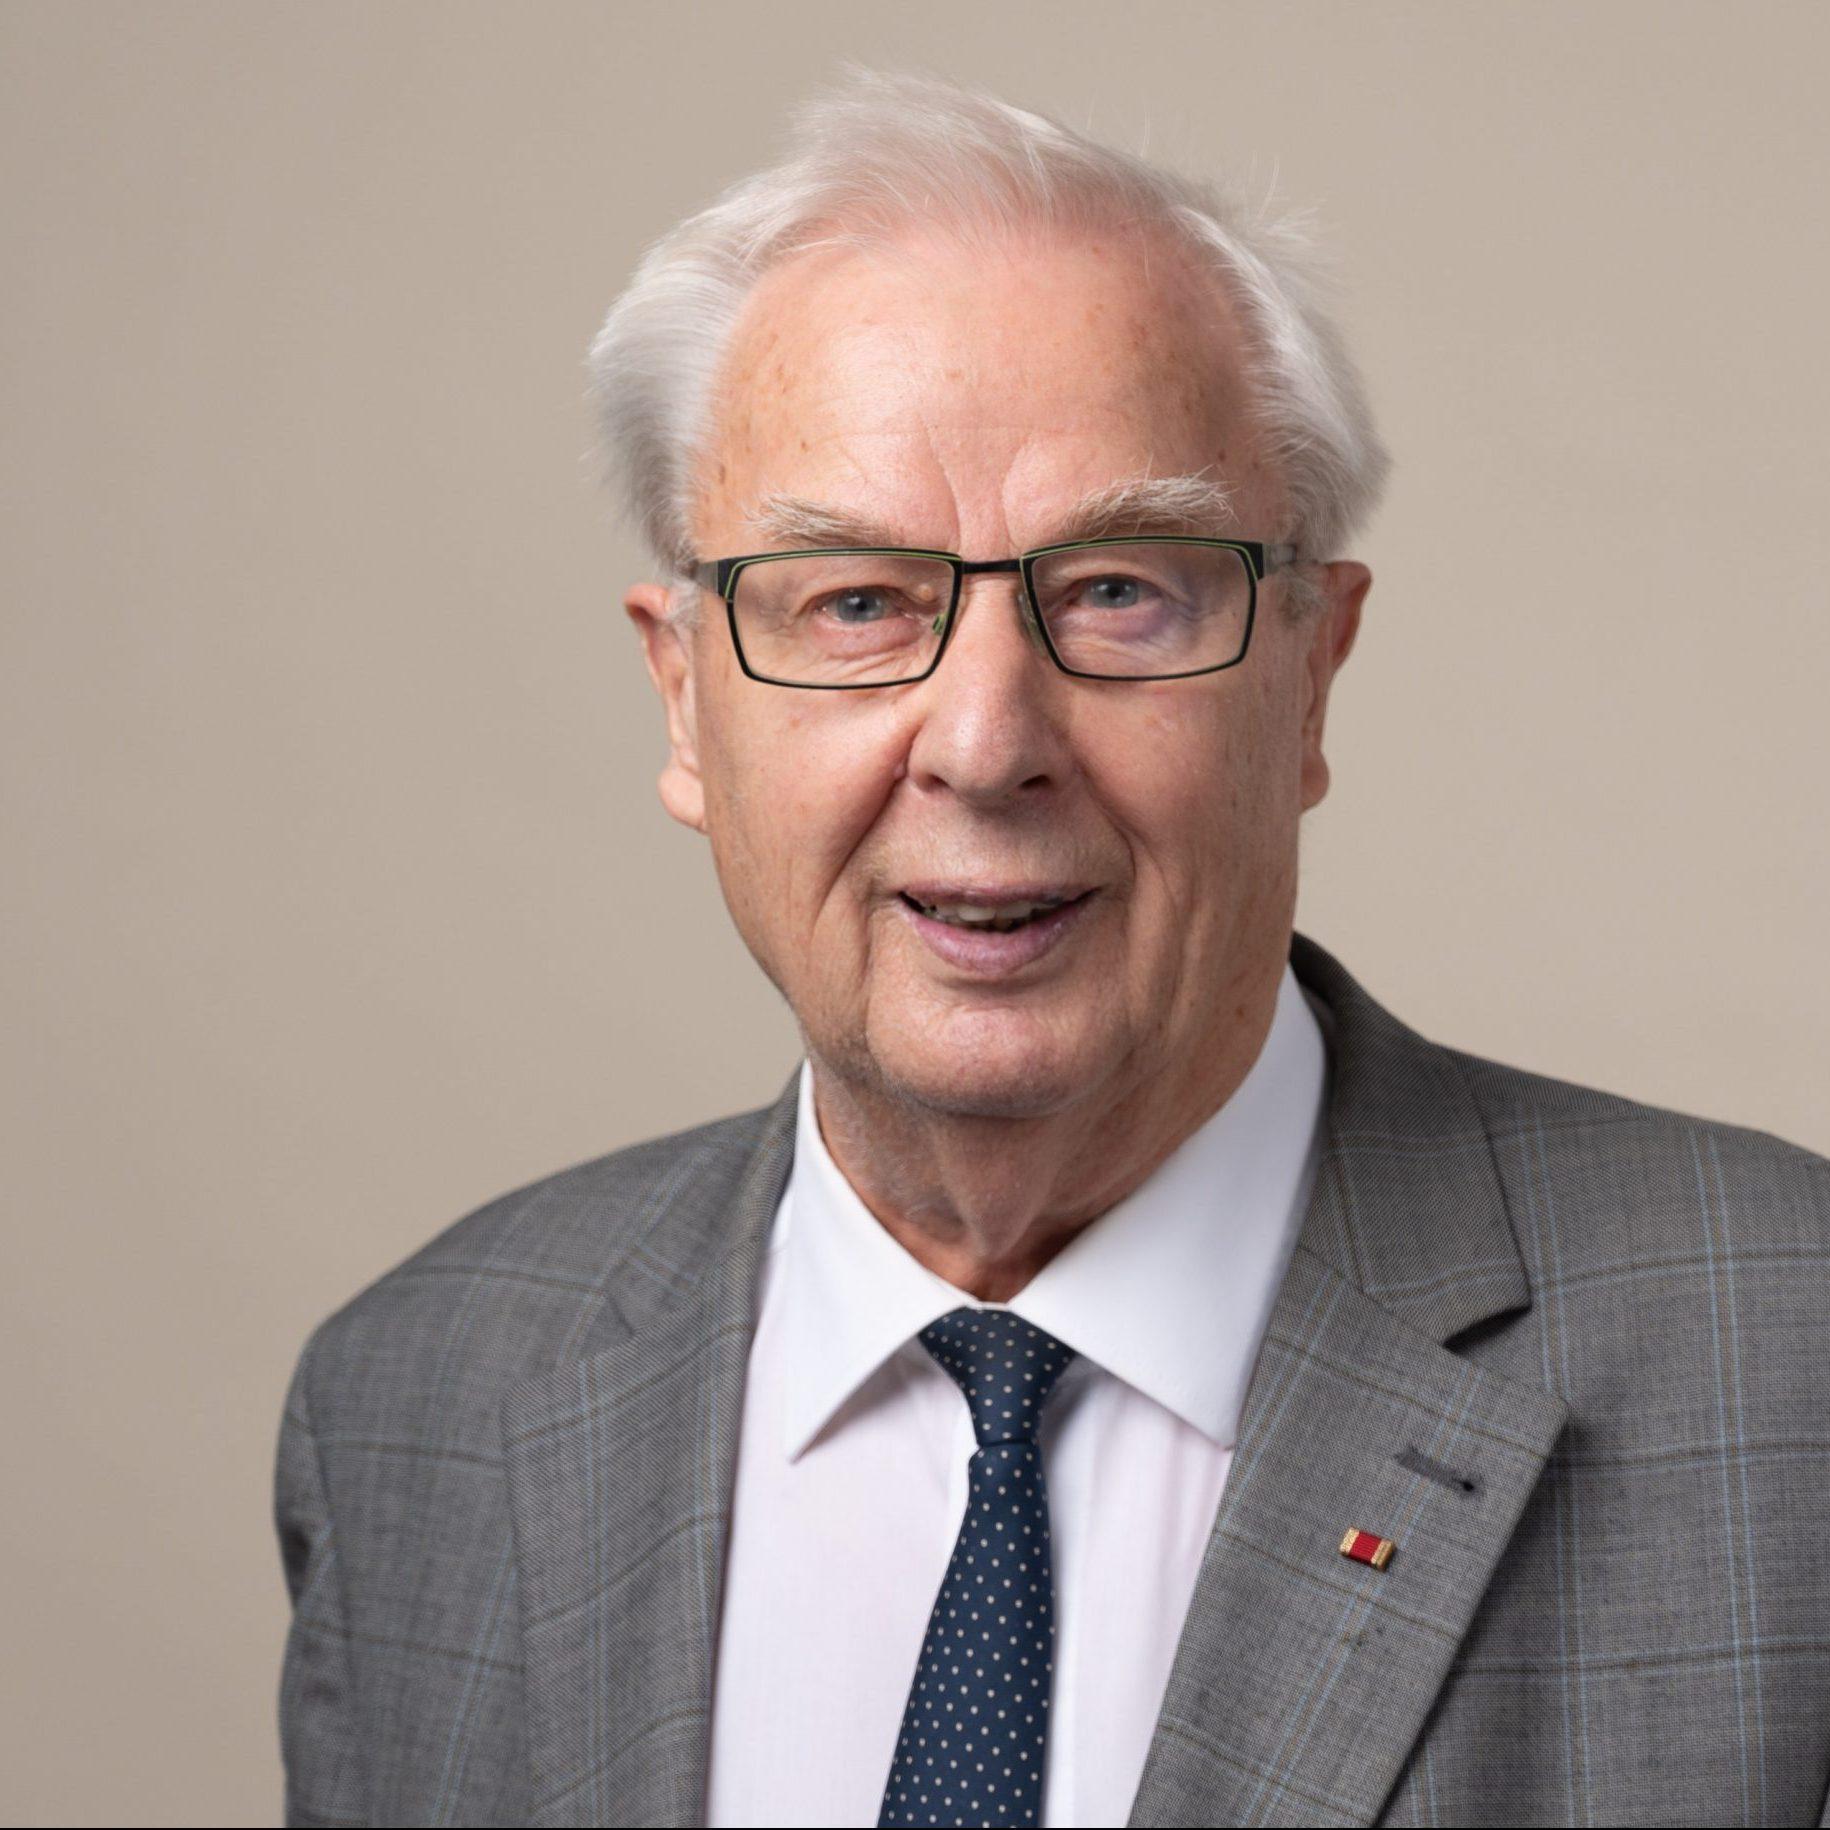 Wilhelm Brügmann